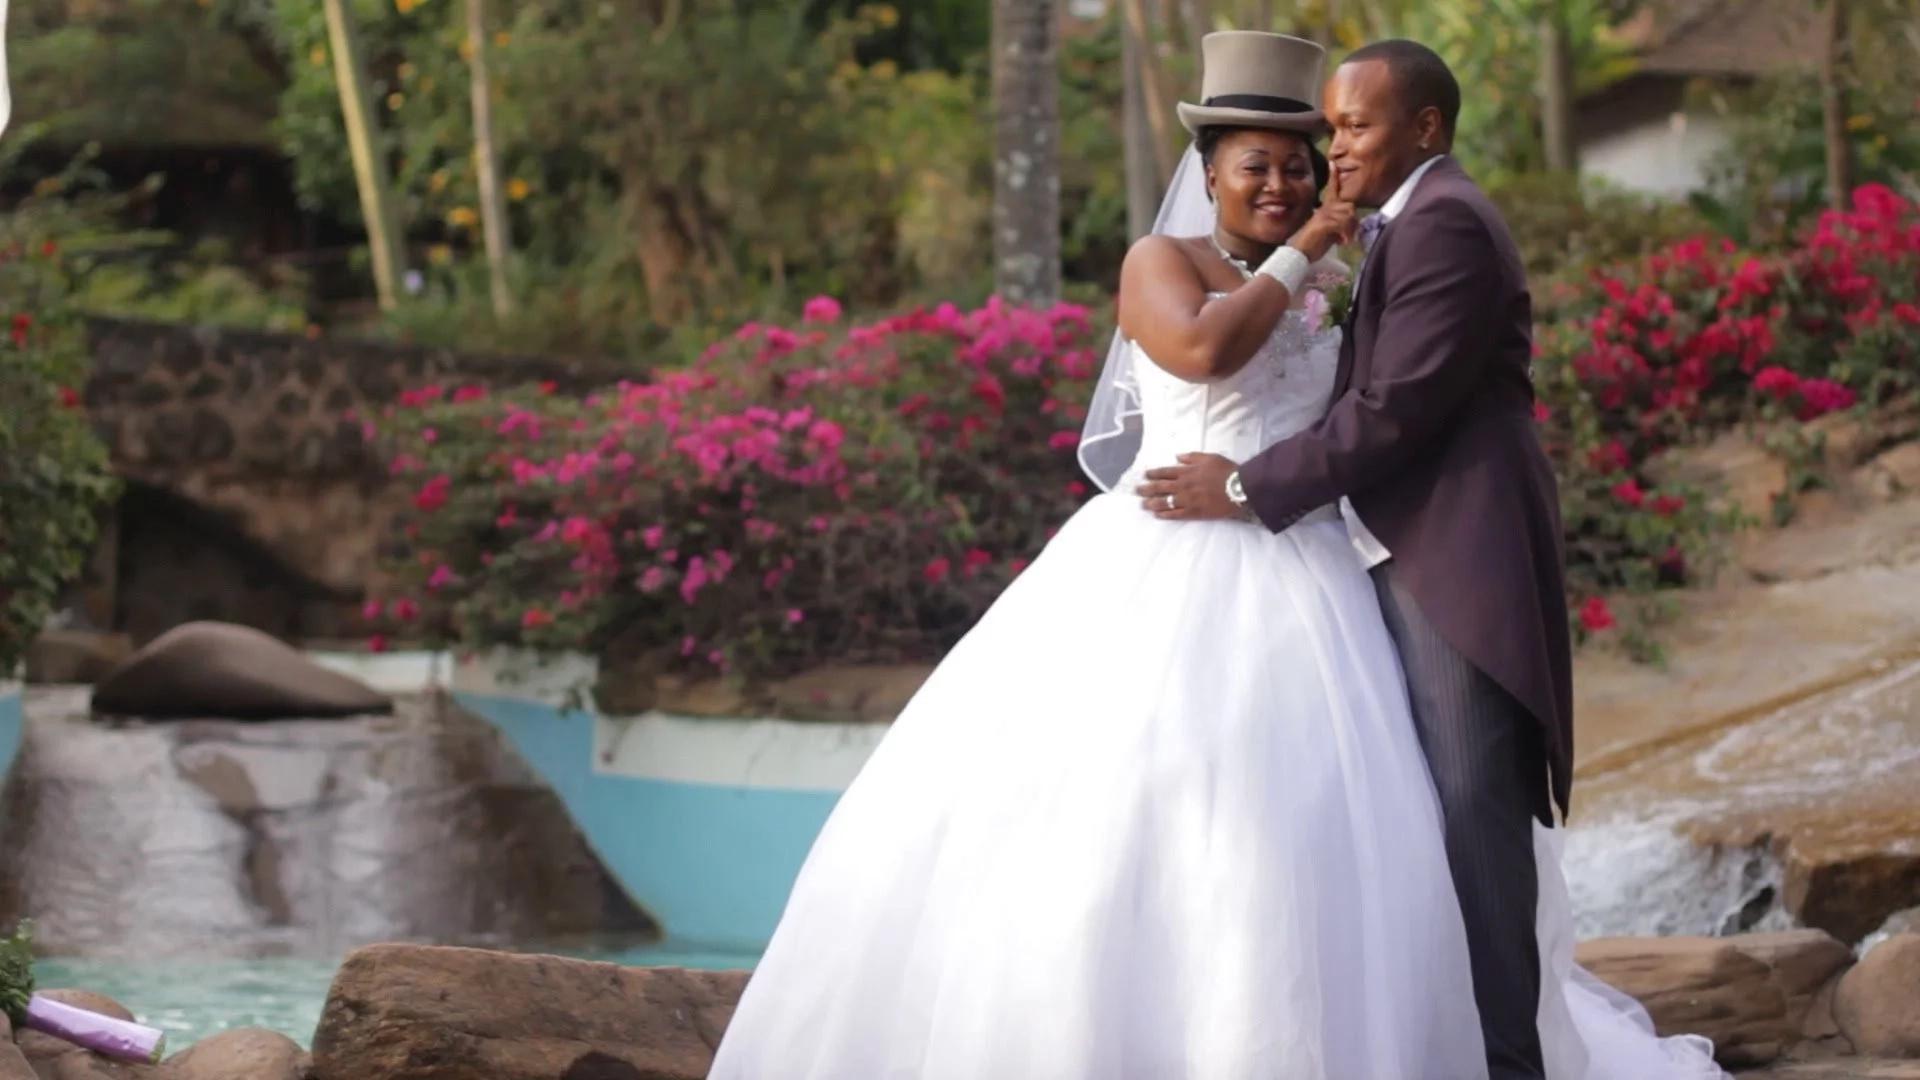 Wedding Gowns In Kenya And Their Prices 2018 Tuko.co.ke